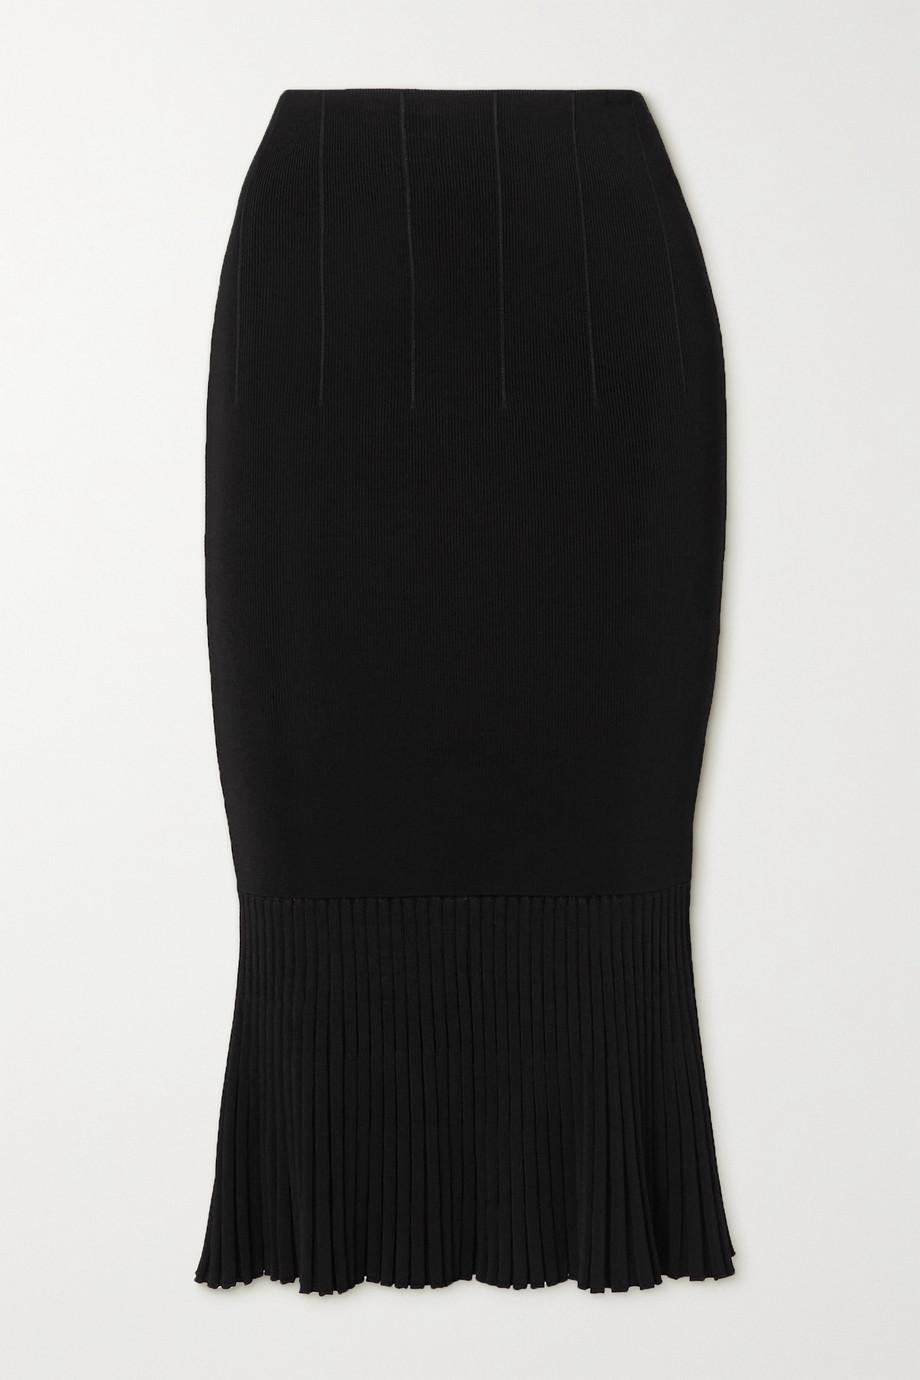 Galvan Atlanta pleated ribbed stretch-knit skirt